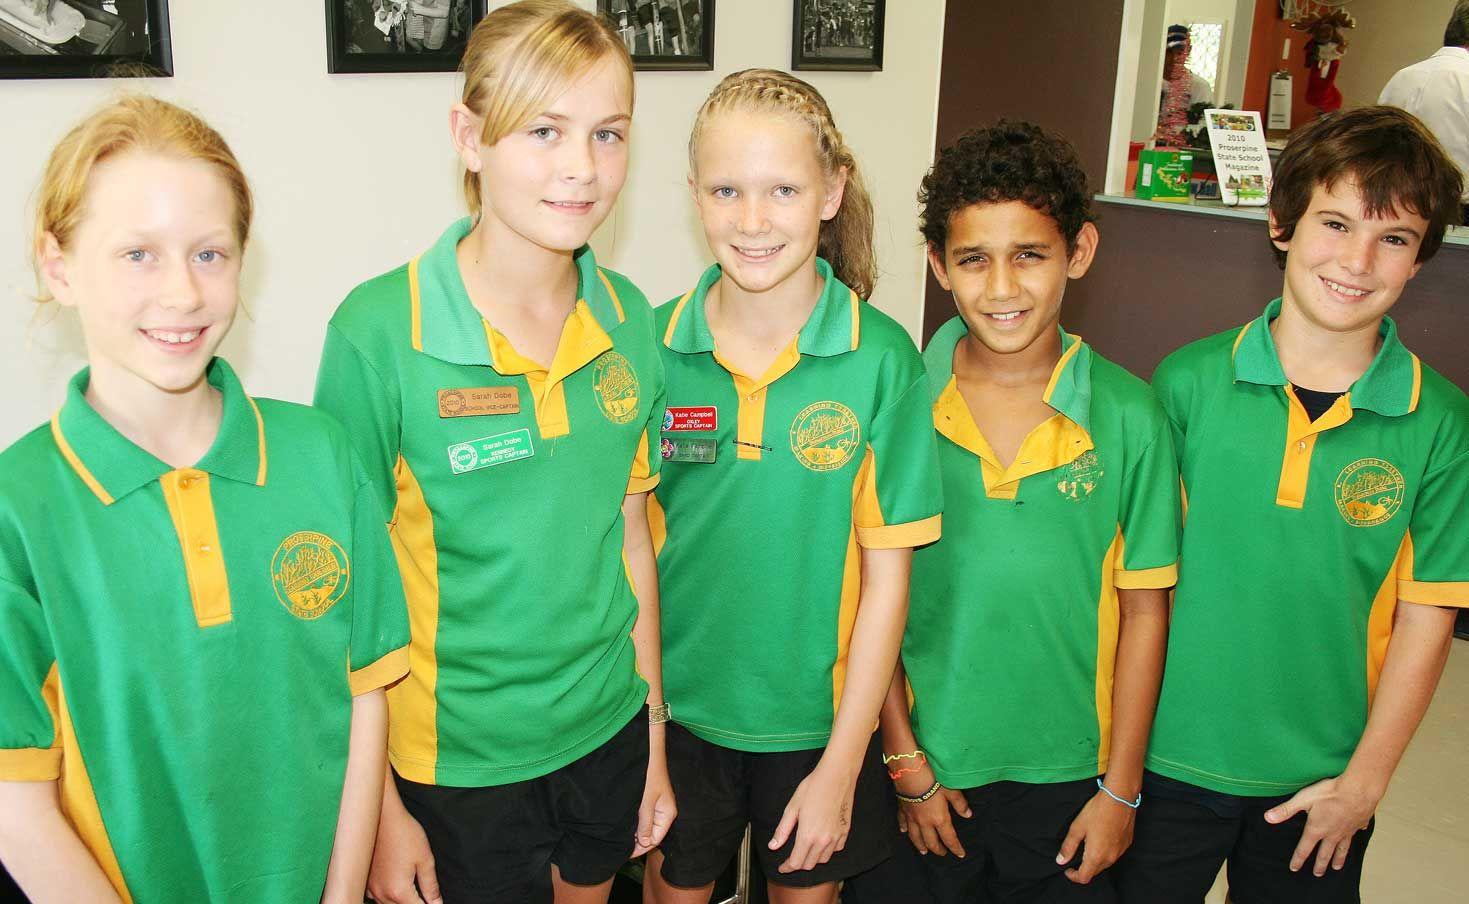 North Queensland representatives for 2010 from Proserpine State Primary School. Heidi Moore, Sarah Dobe, Katie Campbell, Taylor Jones and Adam Skaife.